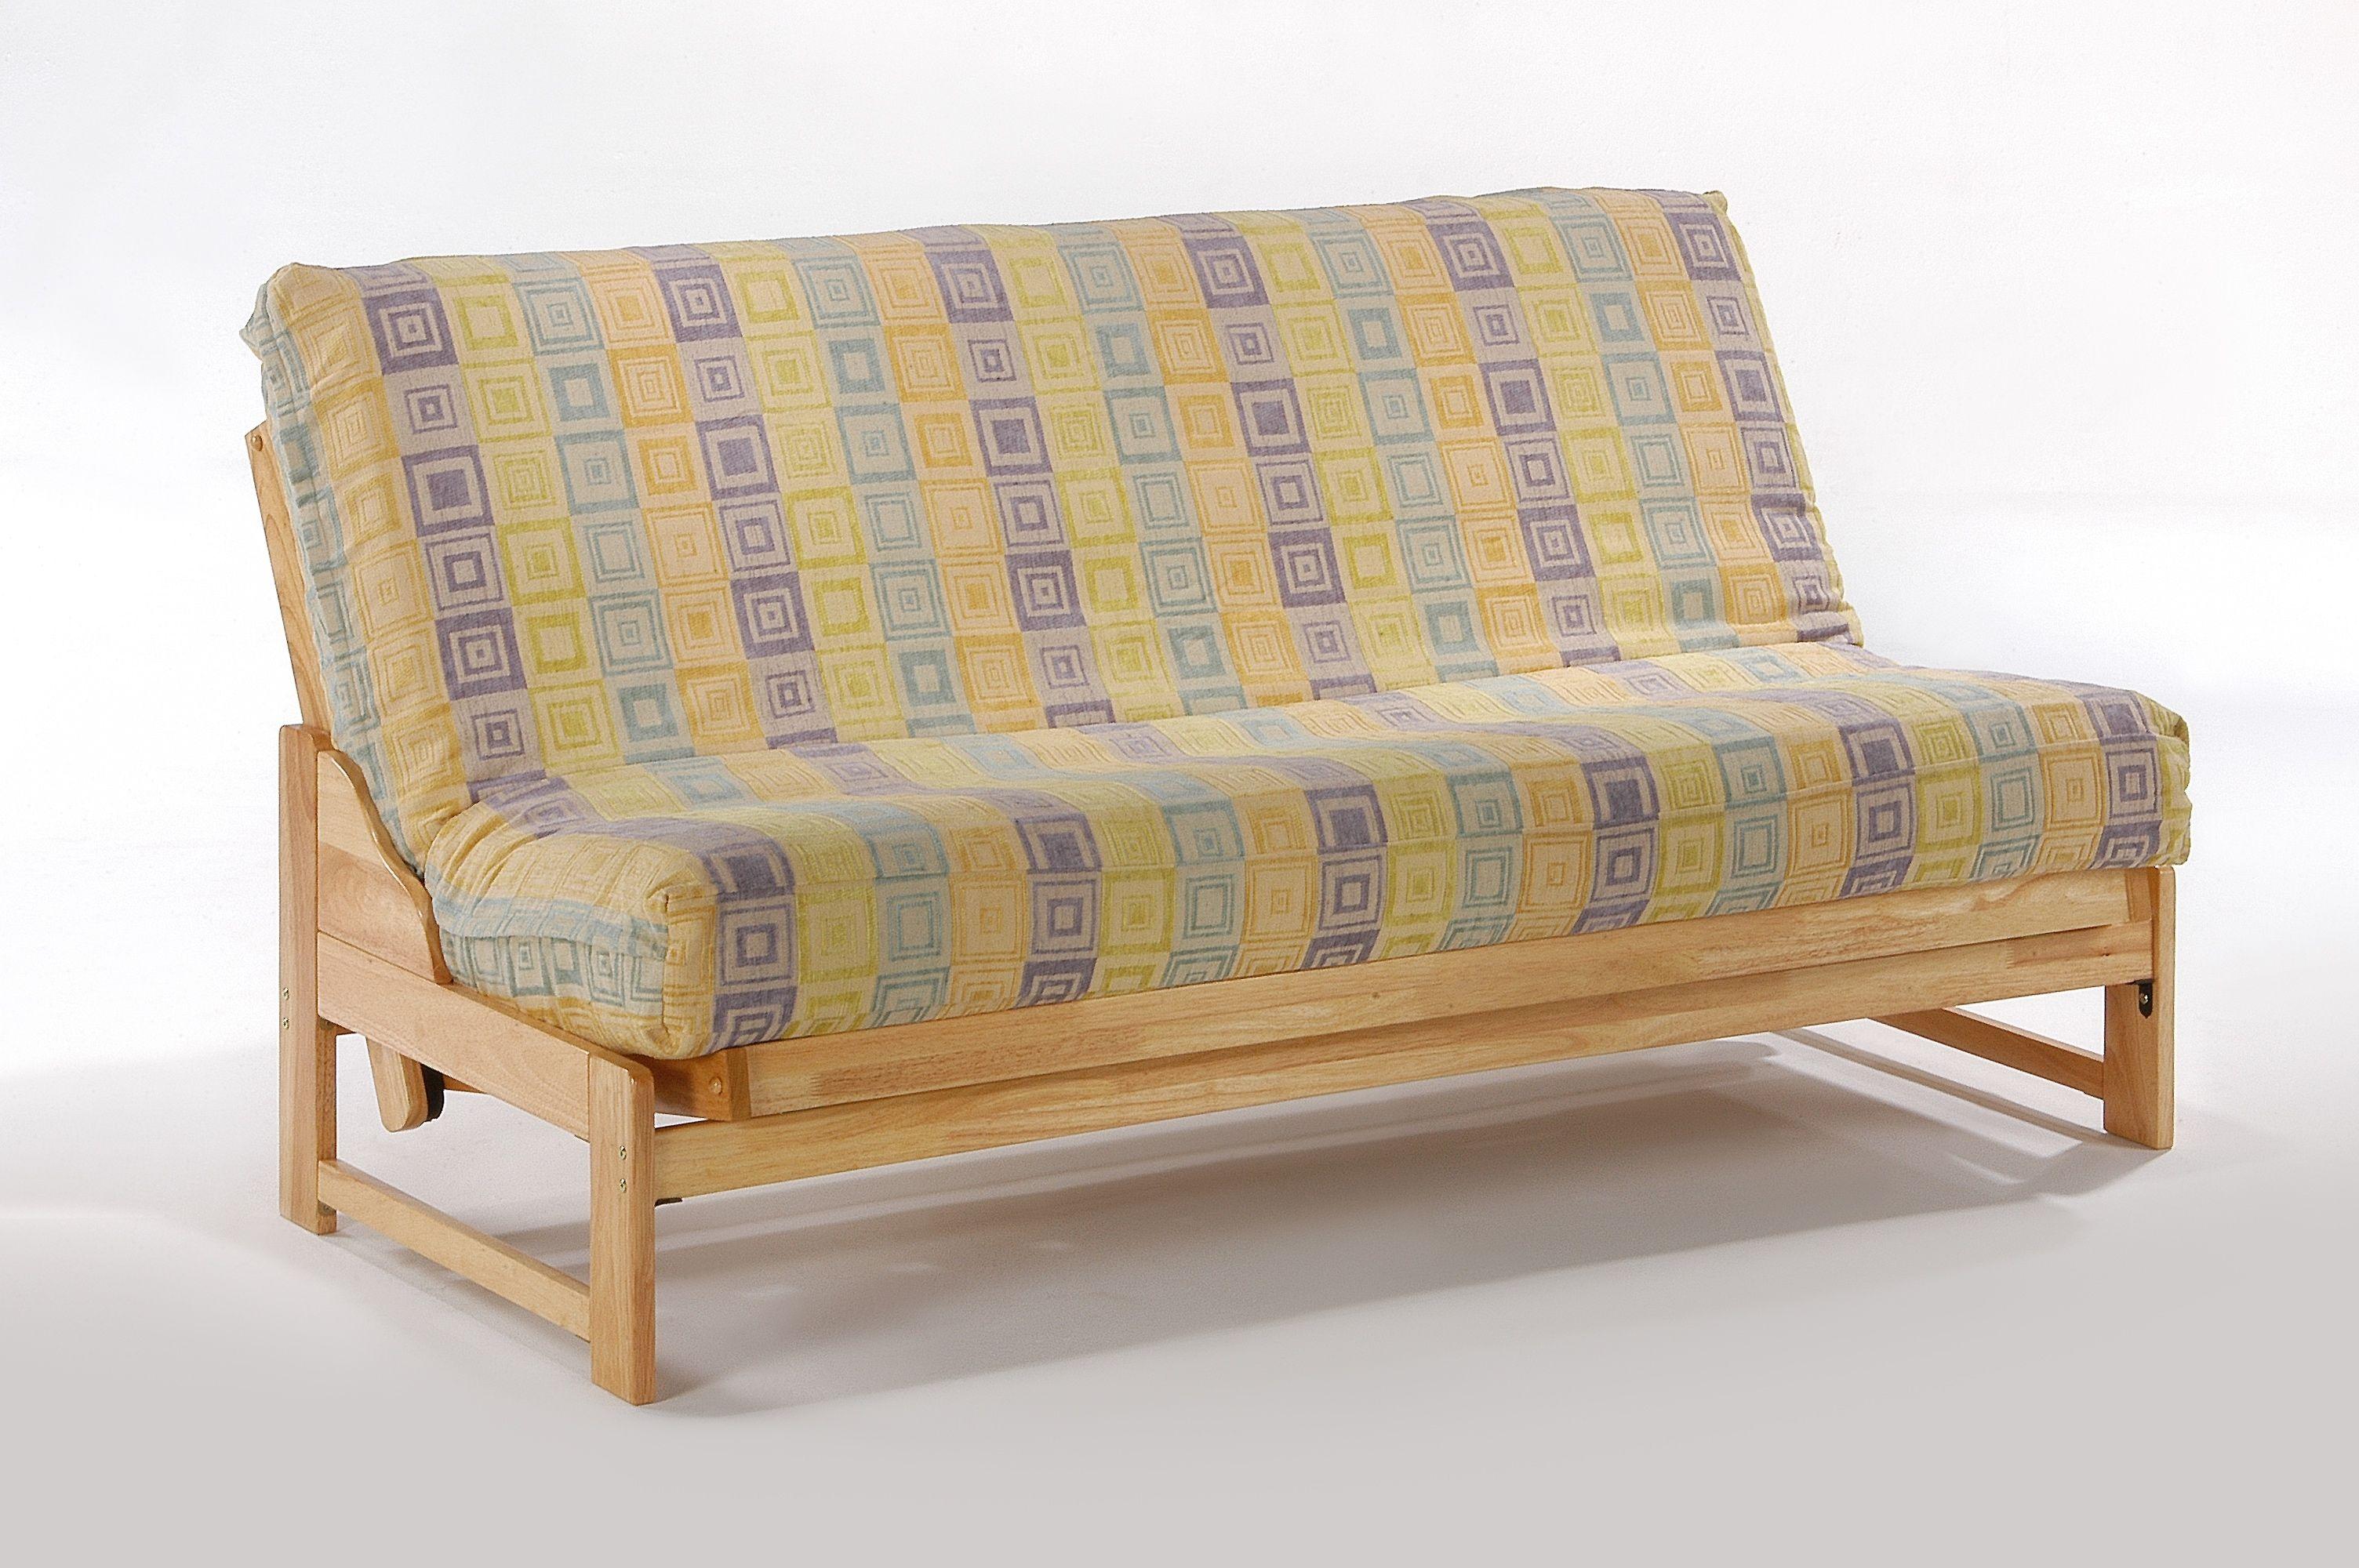 Eureka Microfiber Wood Futon Bed Queen Size Futon Bed Futon